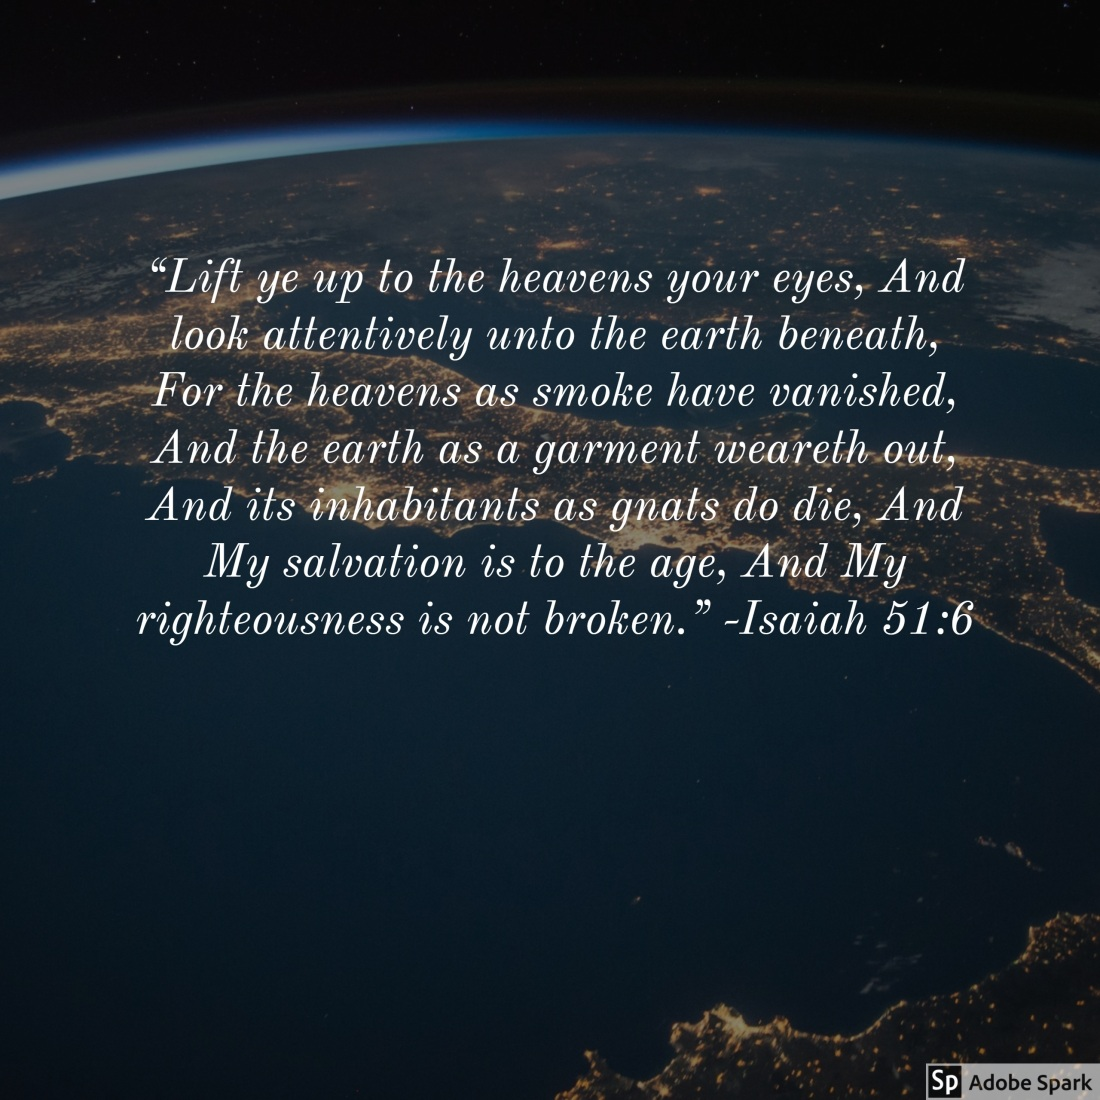 Isaiah 51.6